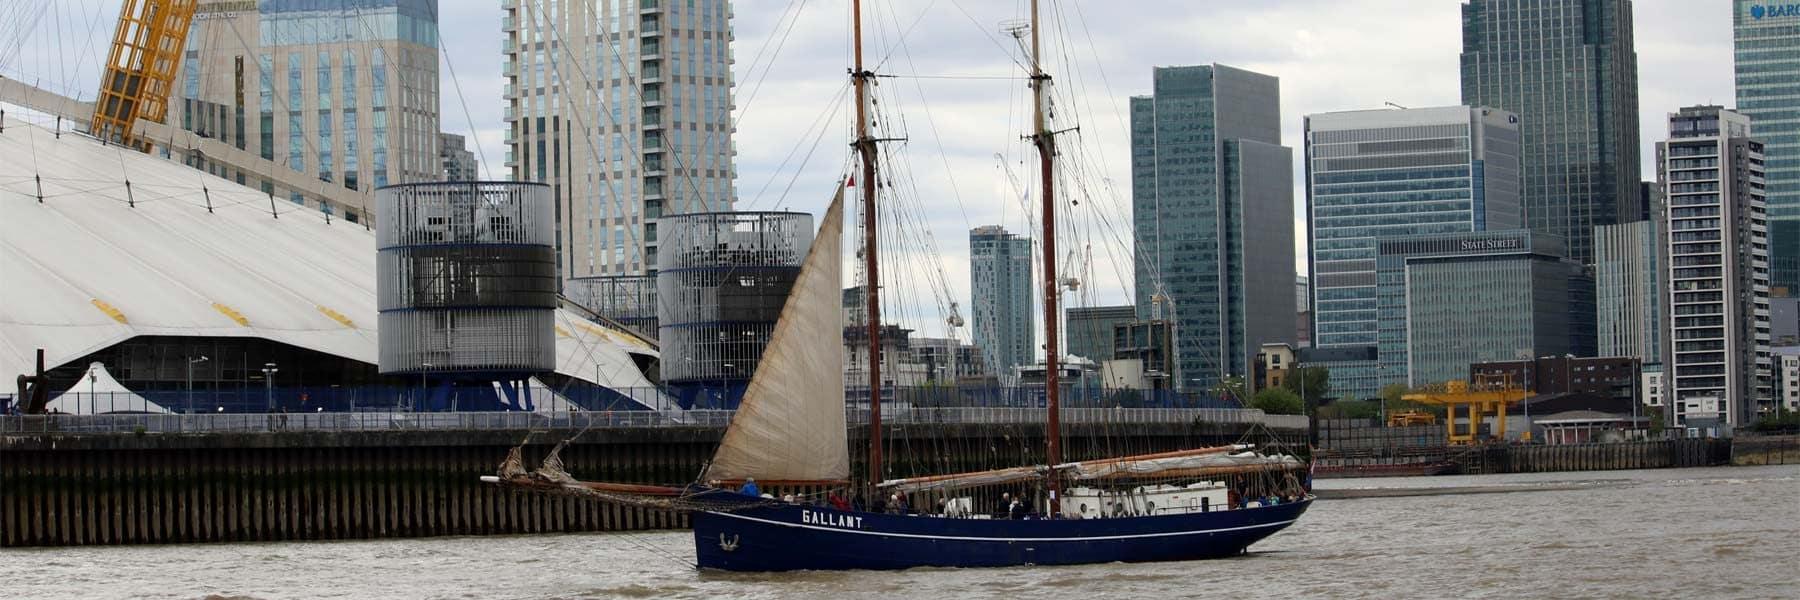 Tall Ship Gallant passing the O2